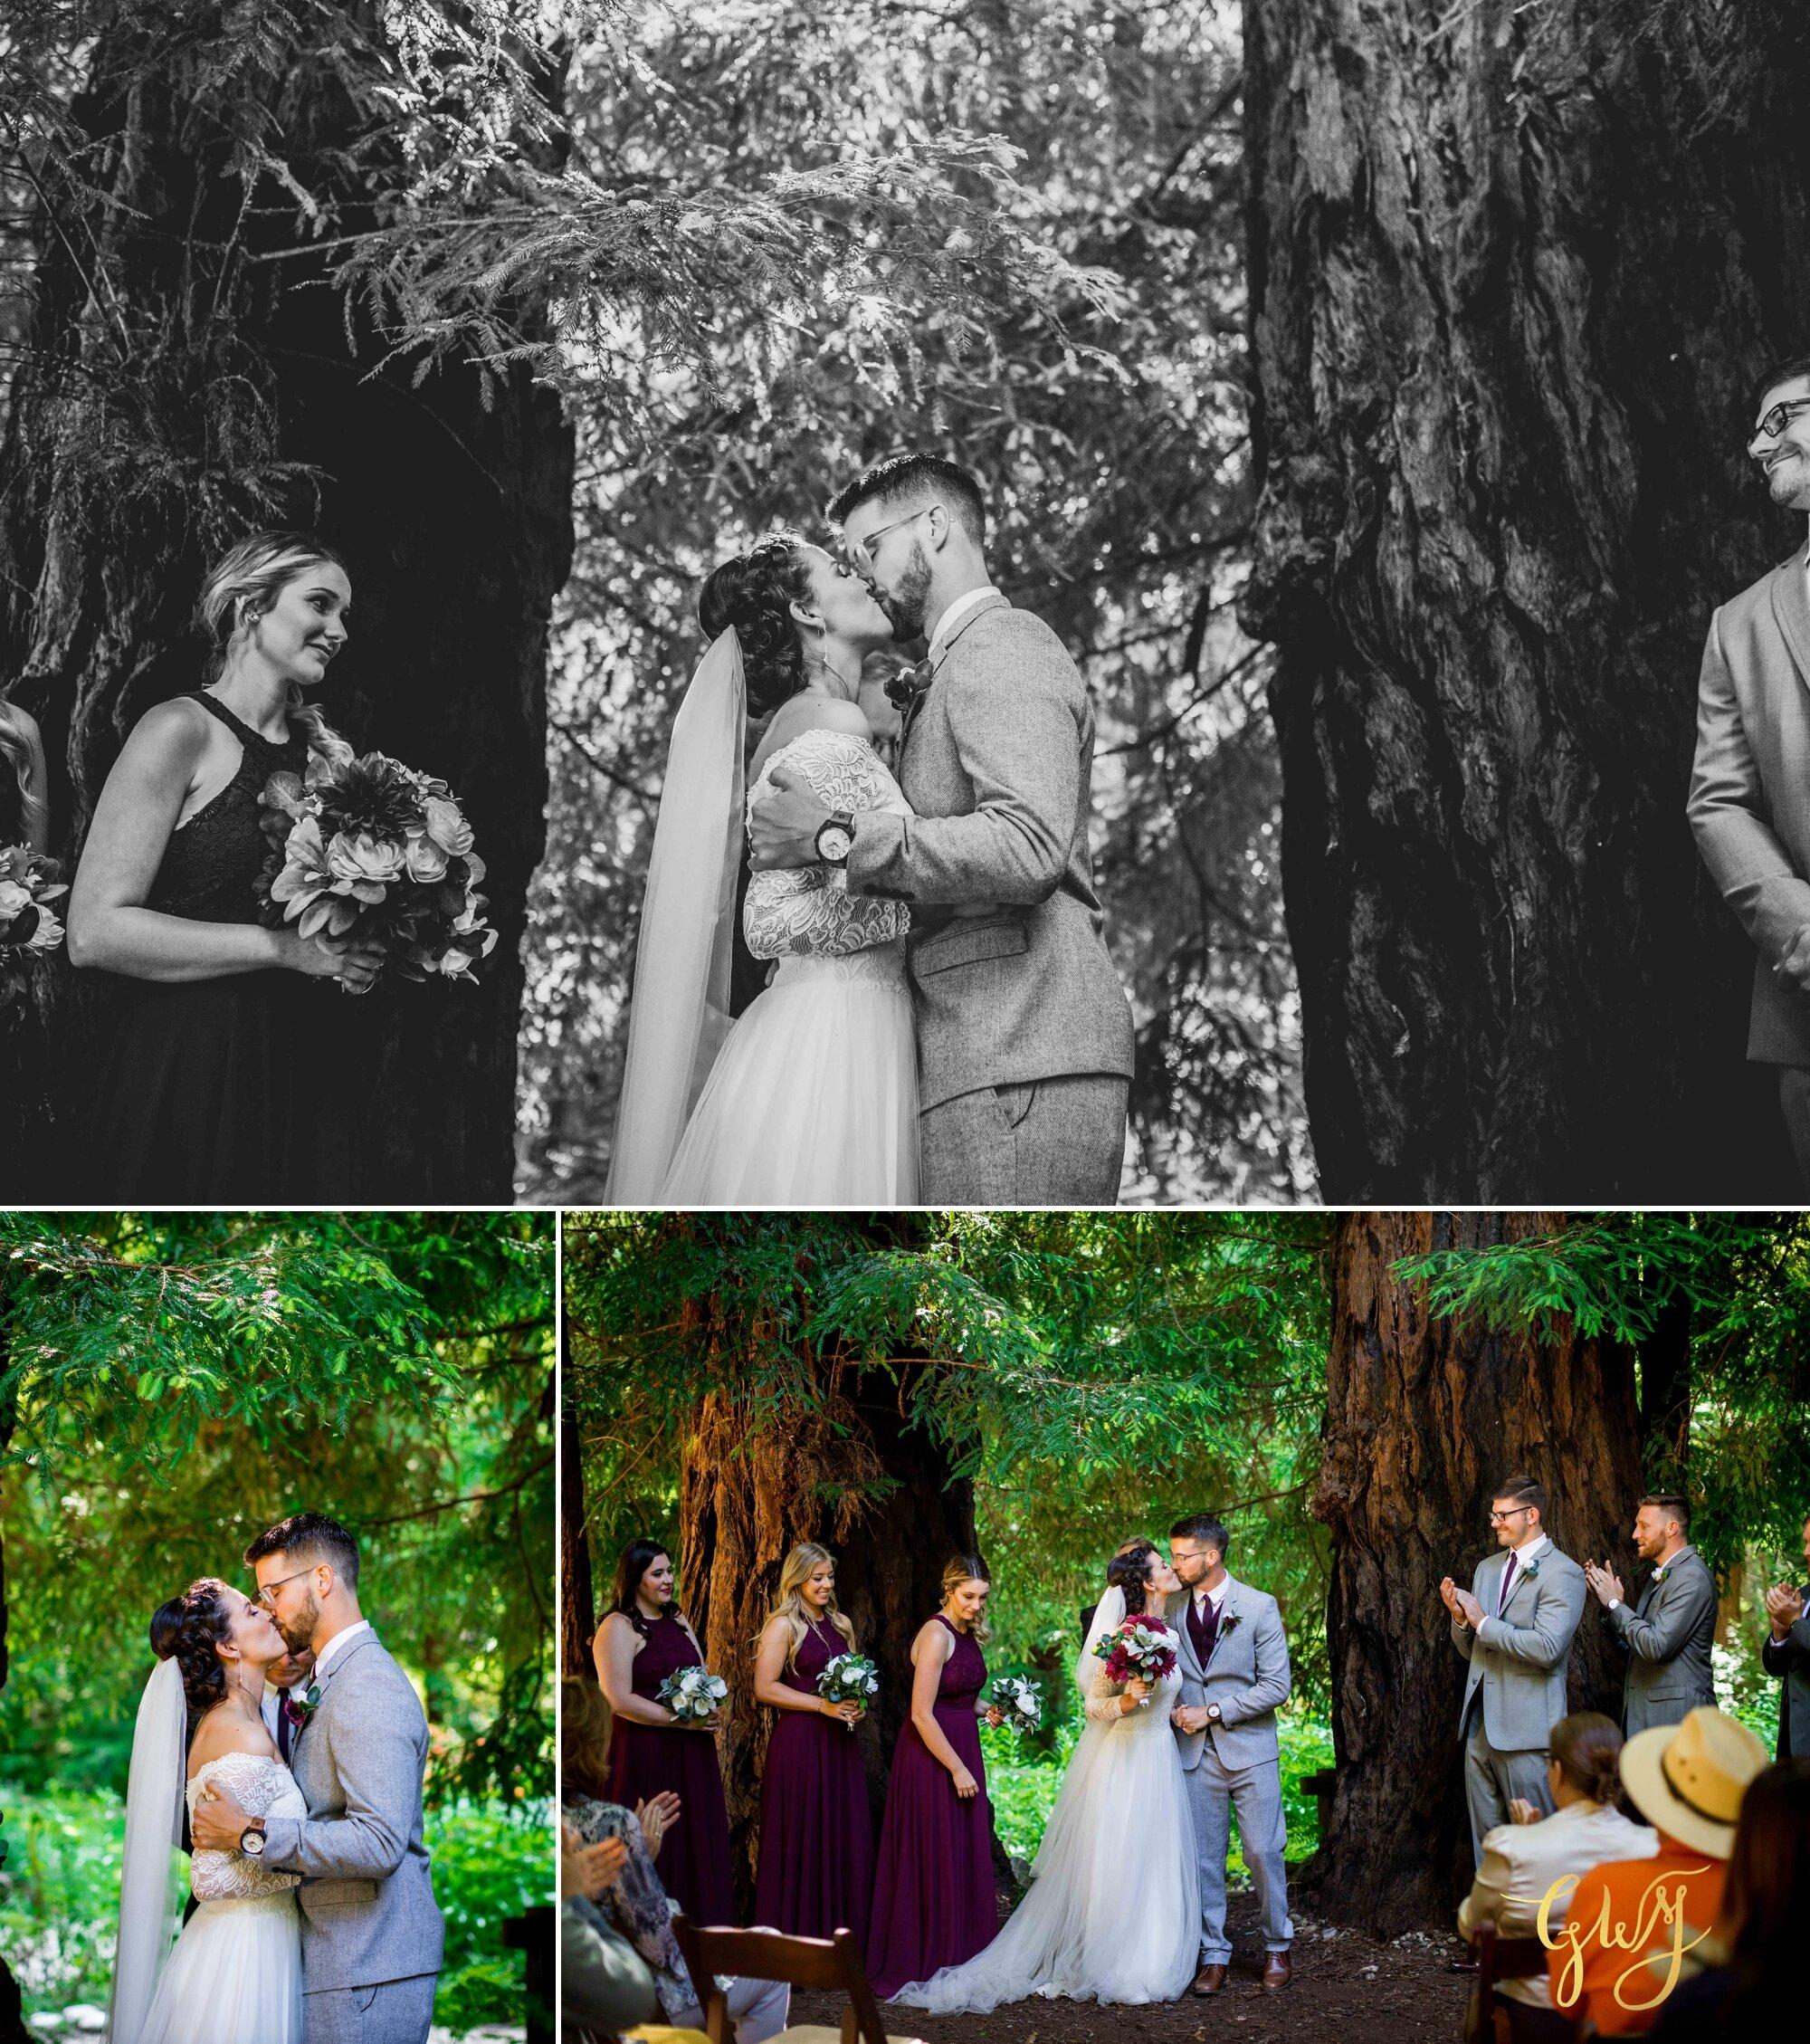 Casey + Jordan's Intimate Big Sur Elopement in the Redwoods by Glass Woods Media 40.jpg